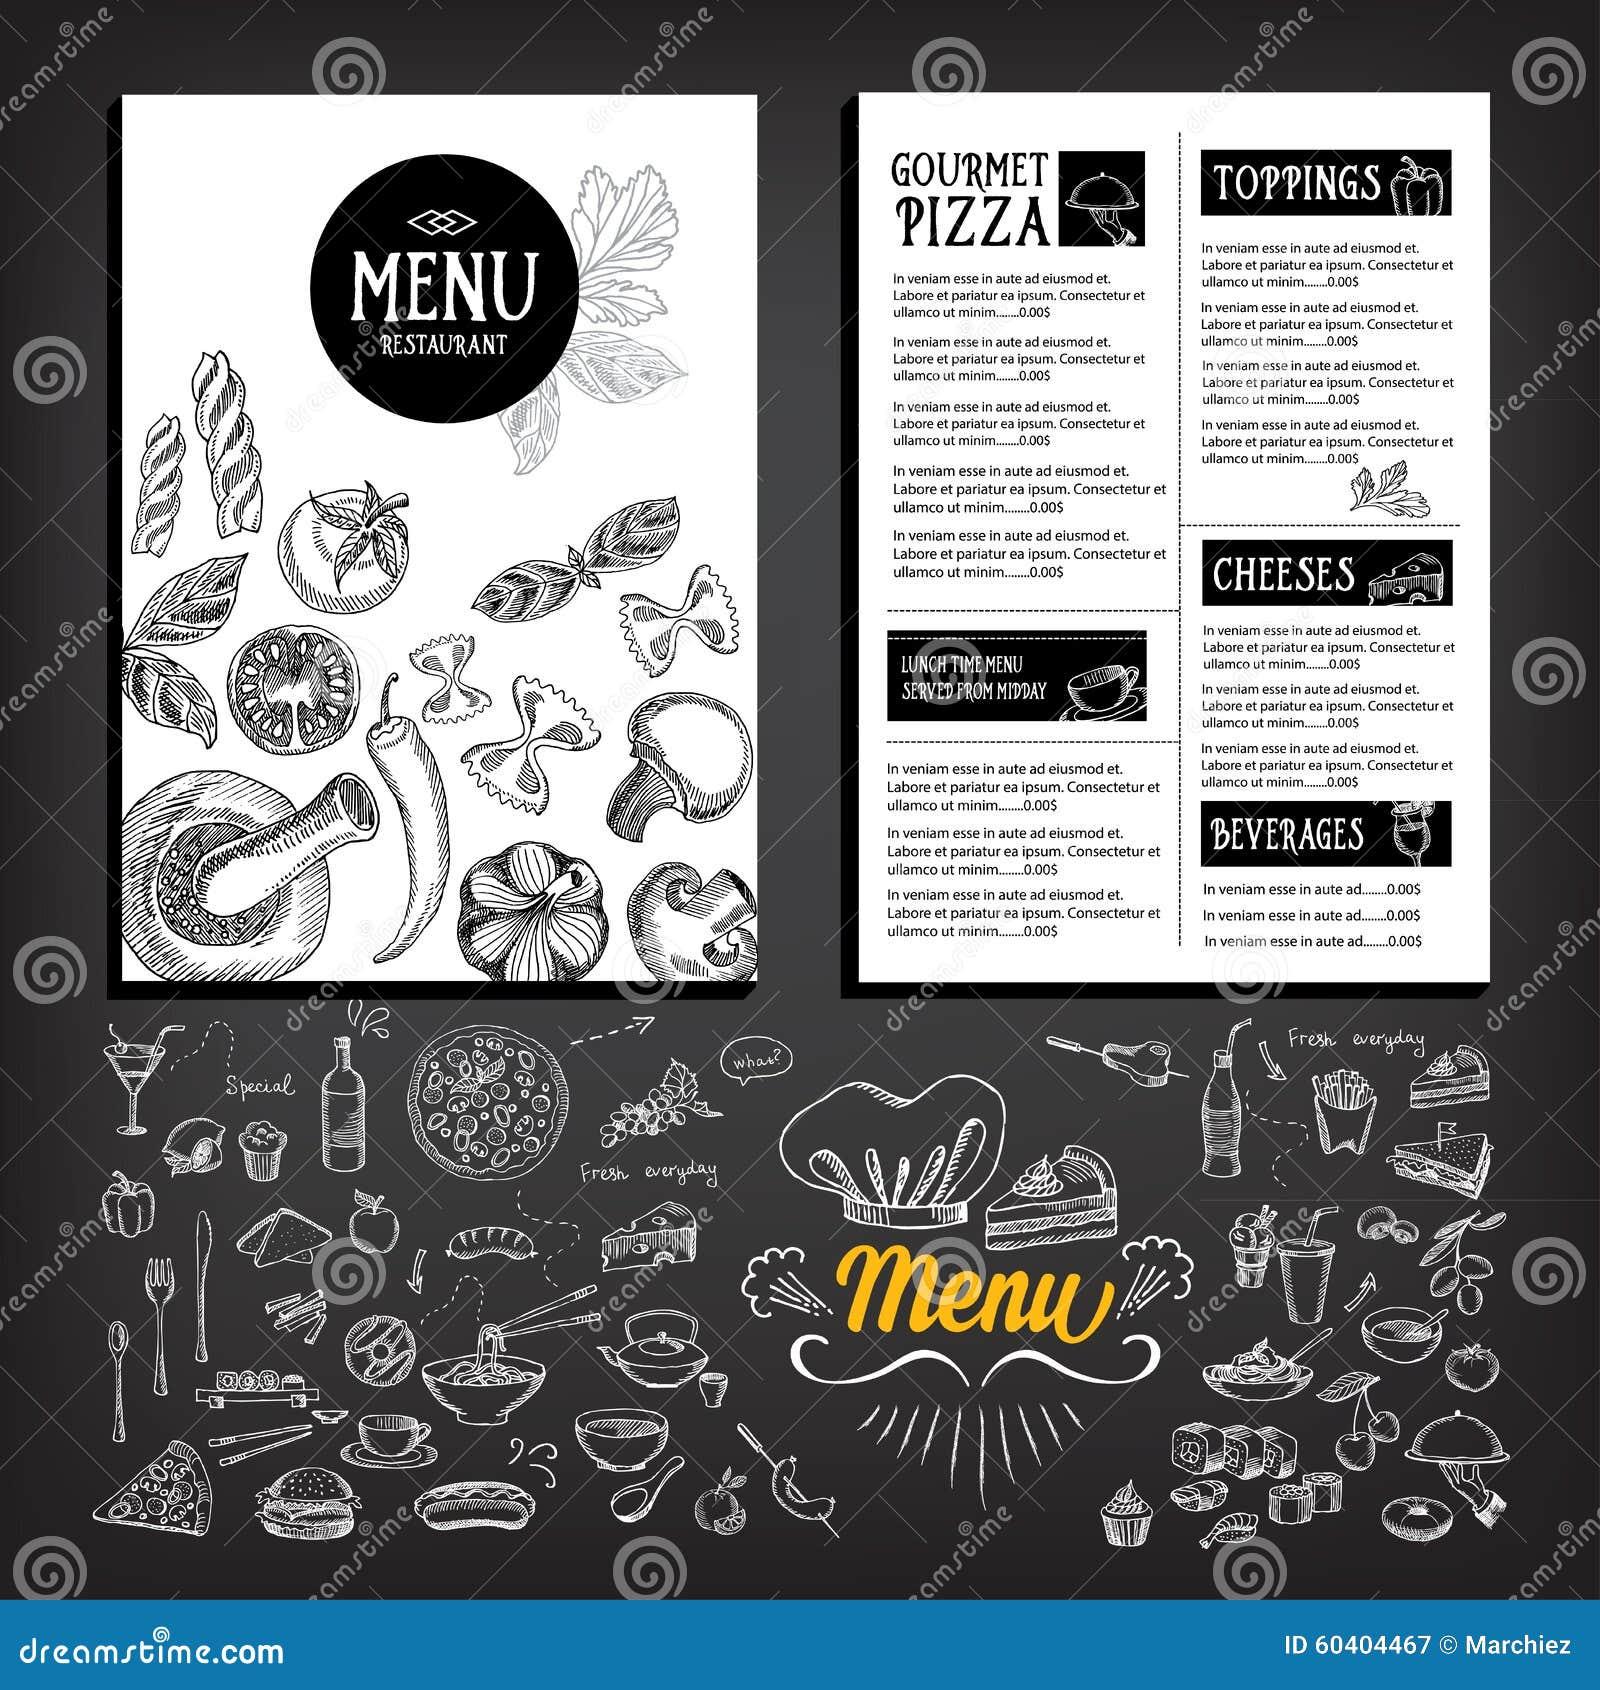 Cafe Menu Restaurant Brochure. Food Design Template Stock